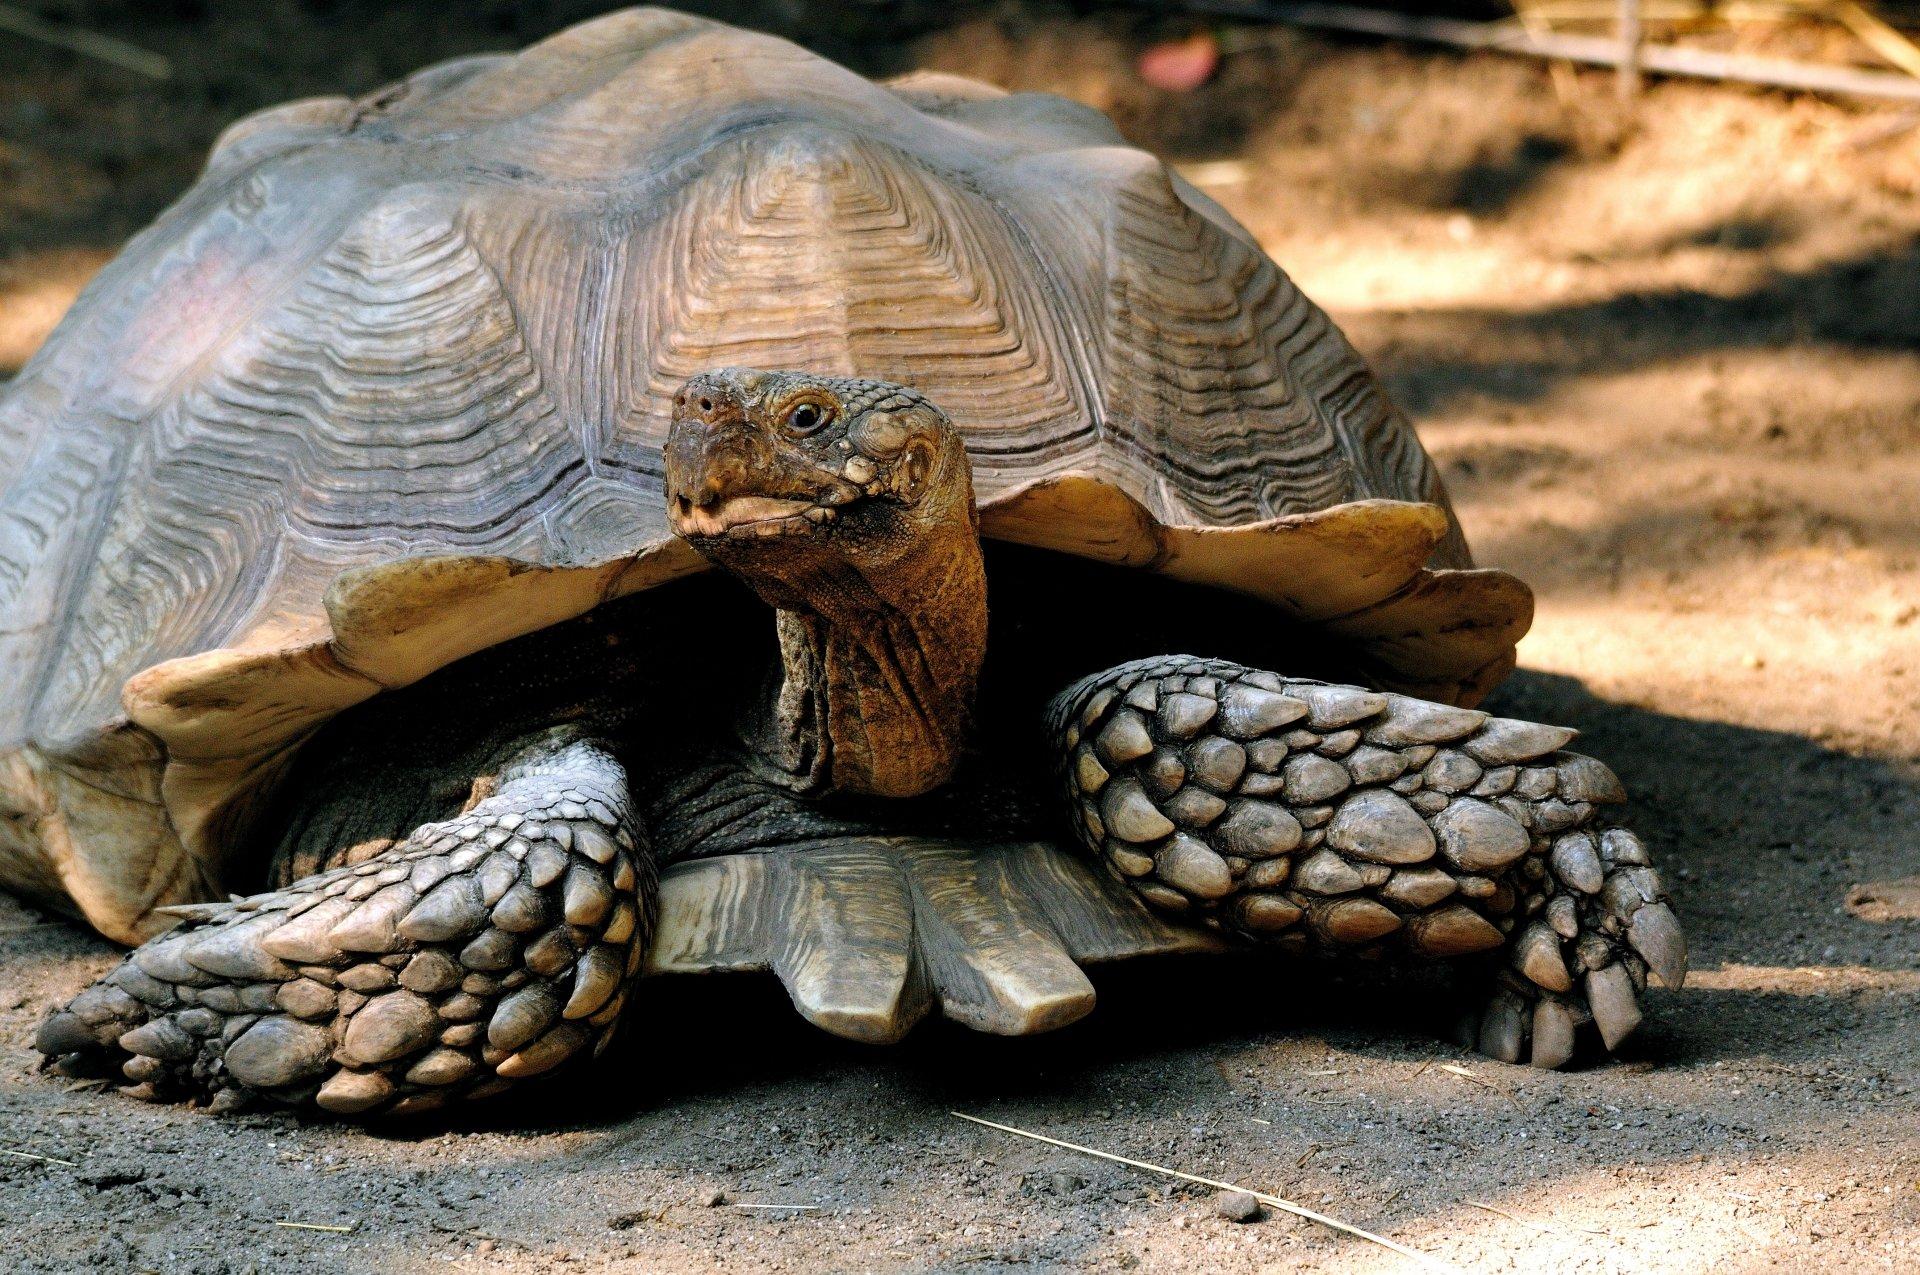 African spurred tortoise 4k ultra papel de parede hd for Tartarughe grandi